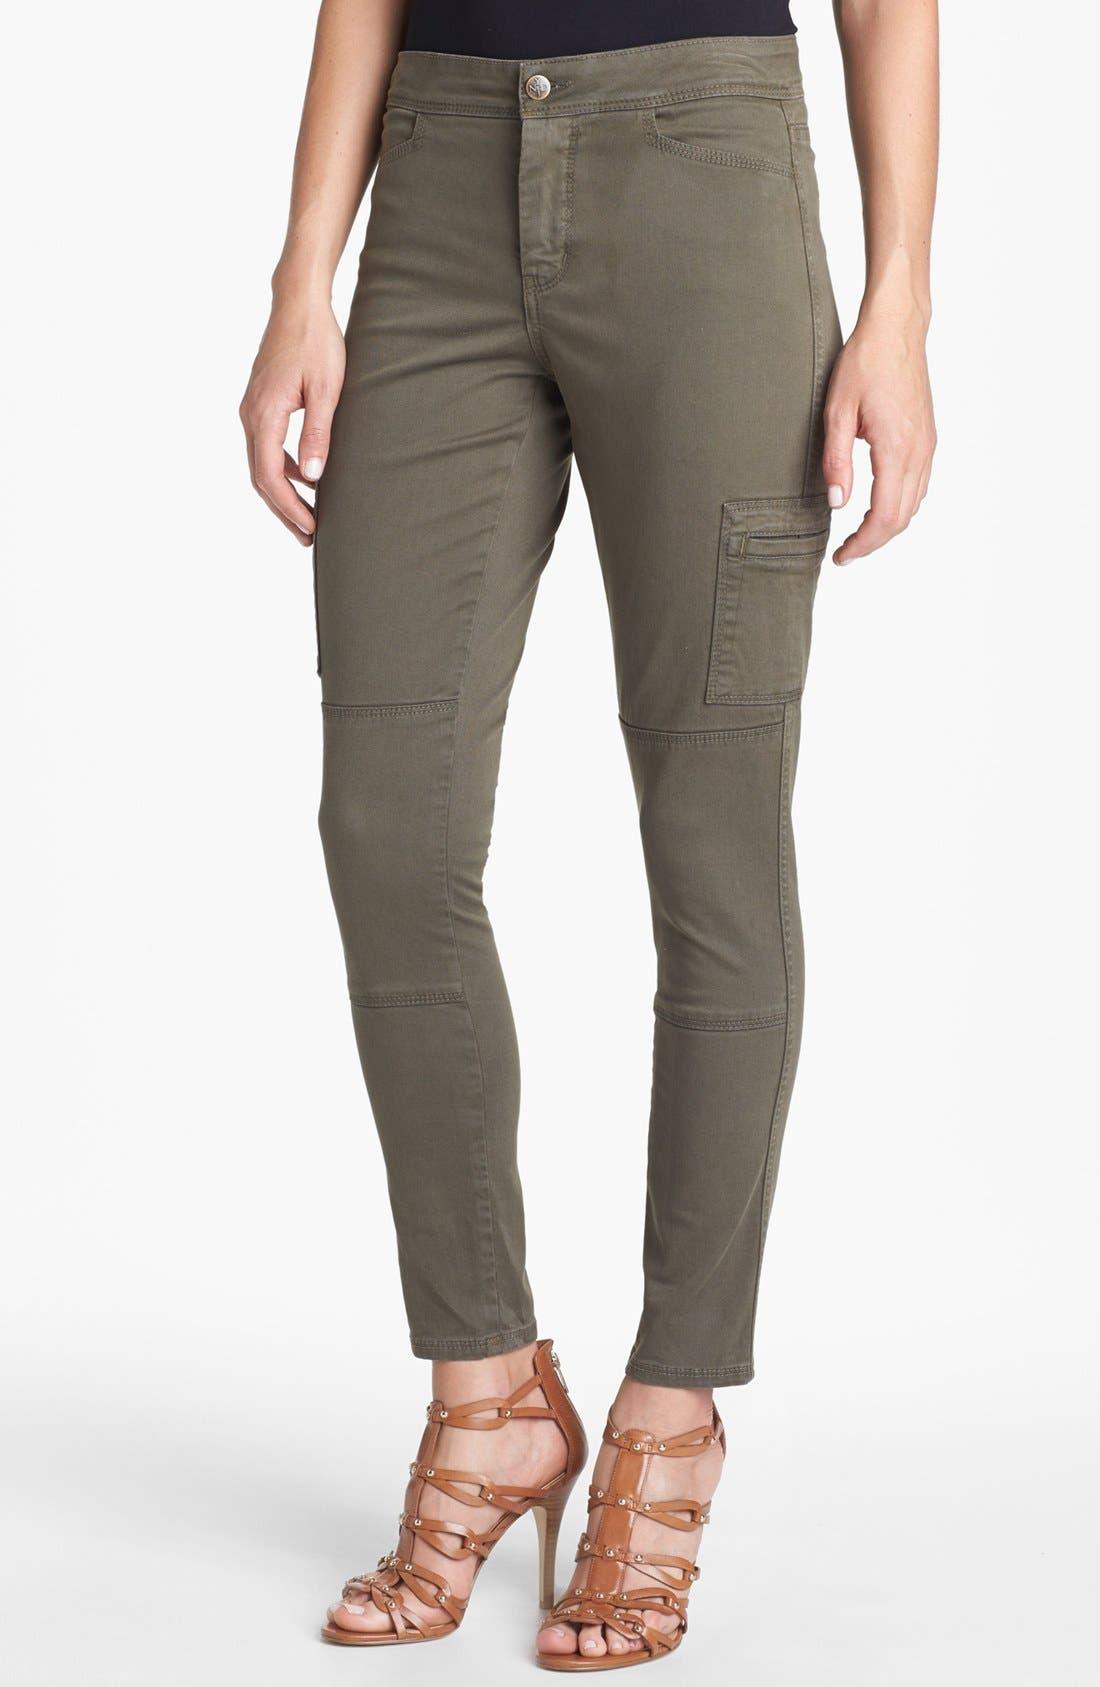 Alternate Image 1 Selected - NYDJ 'Celia' Skinny Cargo Pants (Petite)